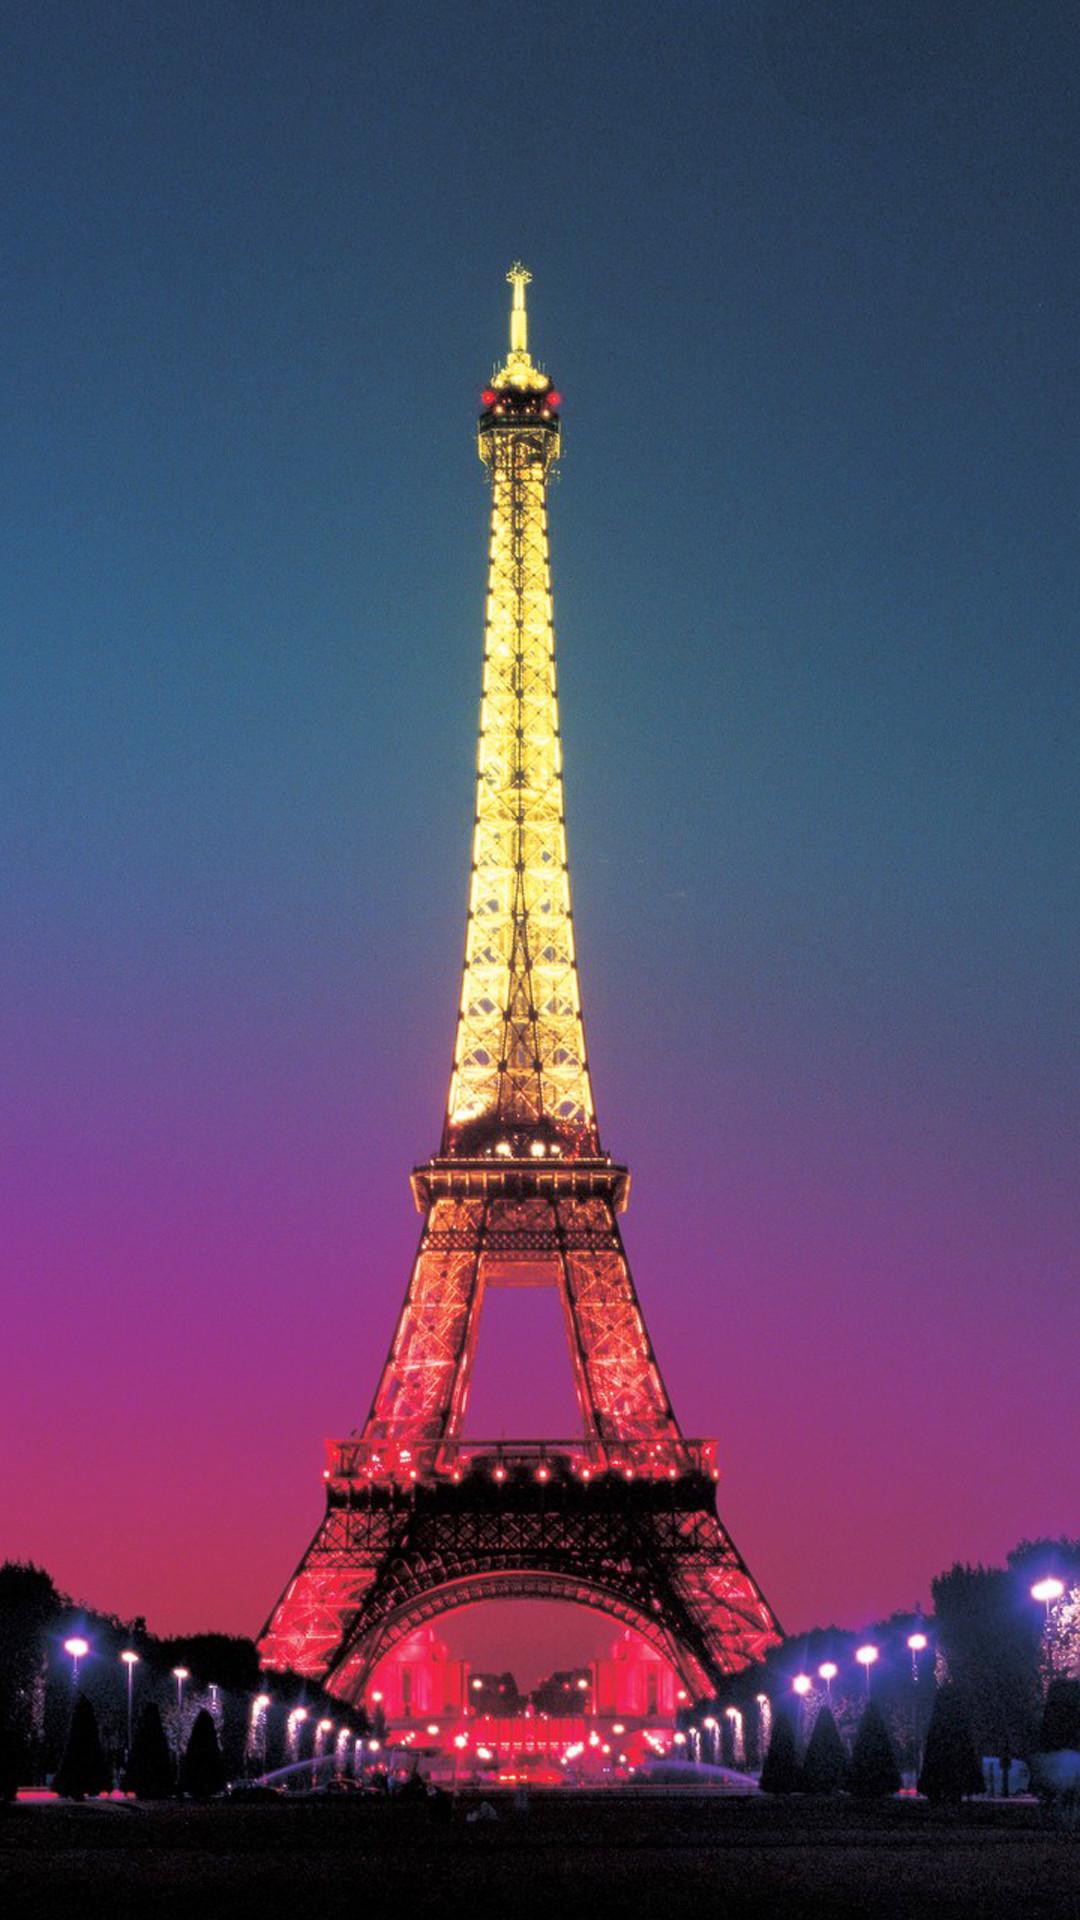 Free Download 69 Cute Paris Wallpapers On Wallpaperplay 1080x1920 For Your Desktop Mobile Tablet Explore 27 Paris Wallpapers Paris Wallpapers Paris Wallpaper Wallpaper Paris